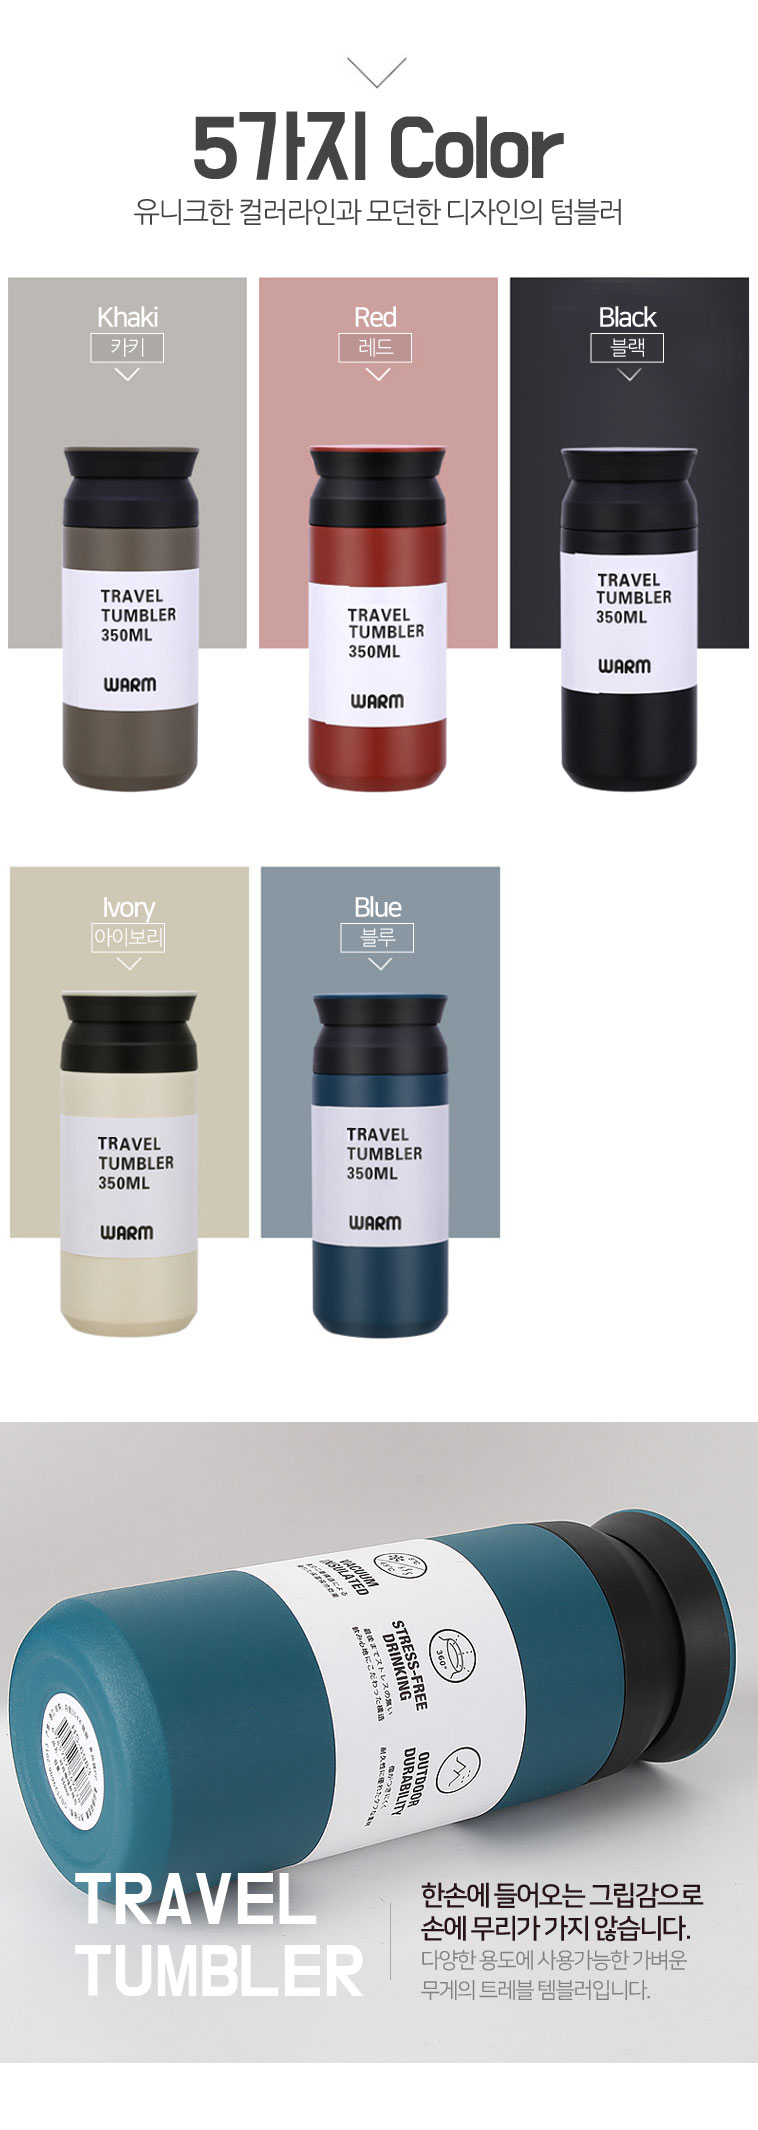 TRAVEL 휴대용 텀블러 350ml 보온병 보냉병 - 소소일상, 15,000원, 보틀/텀블러, 보온보냉병